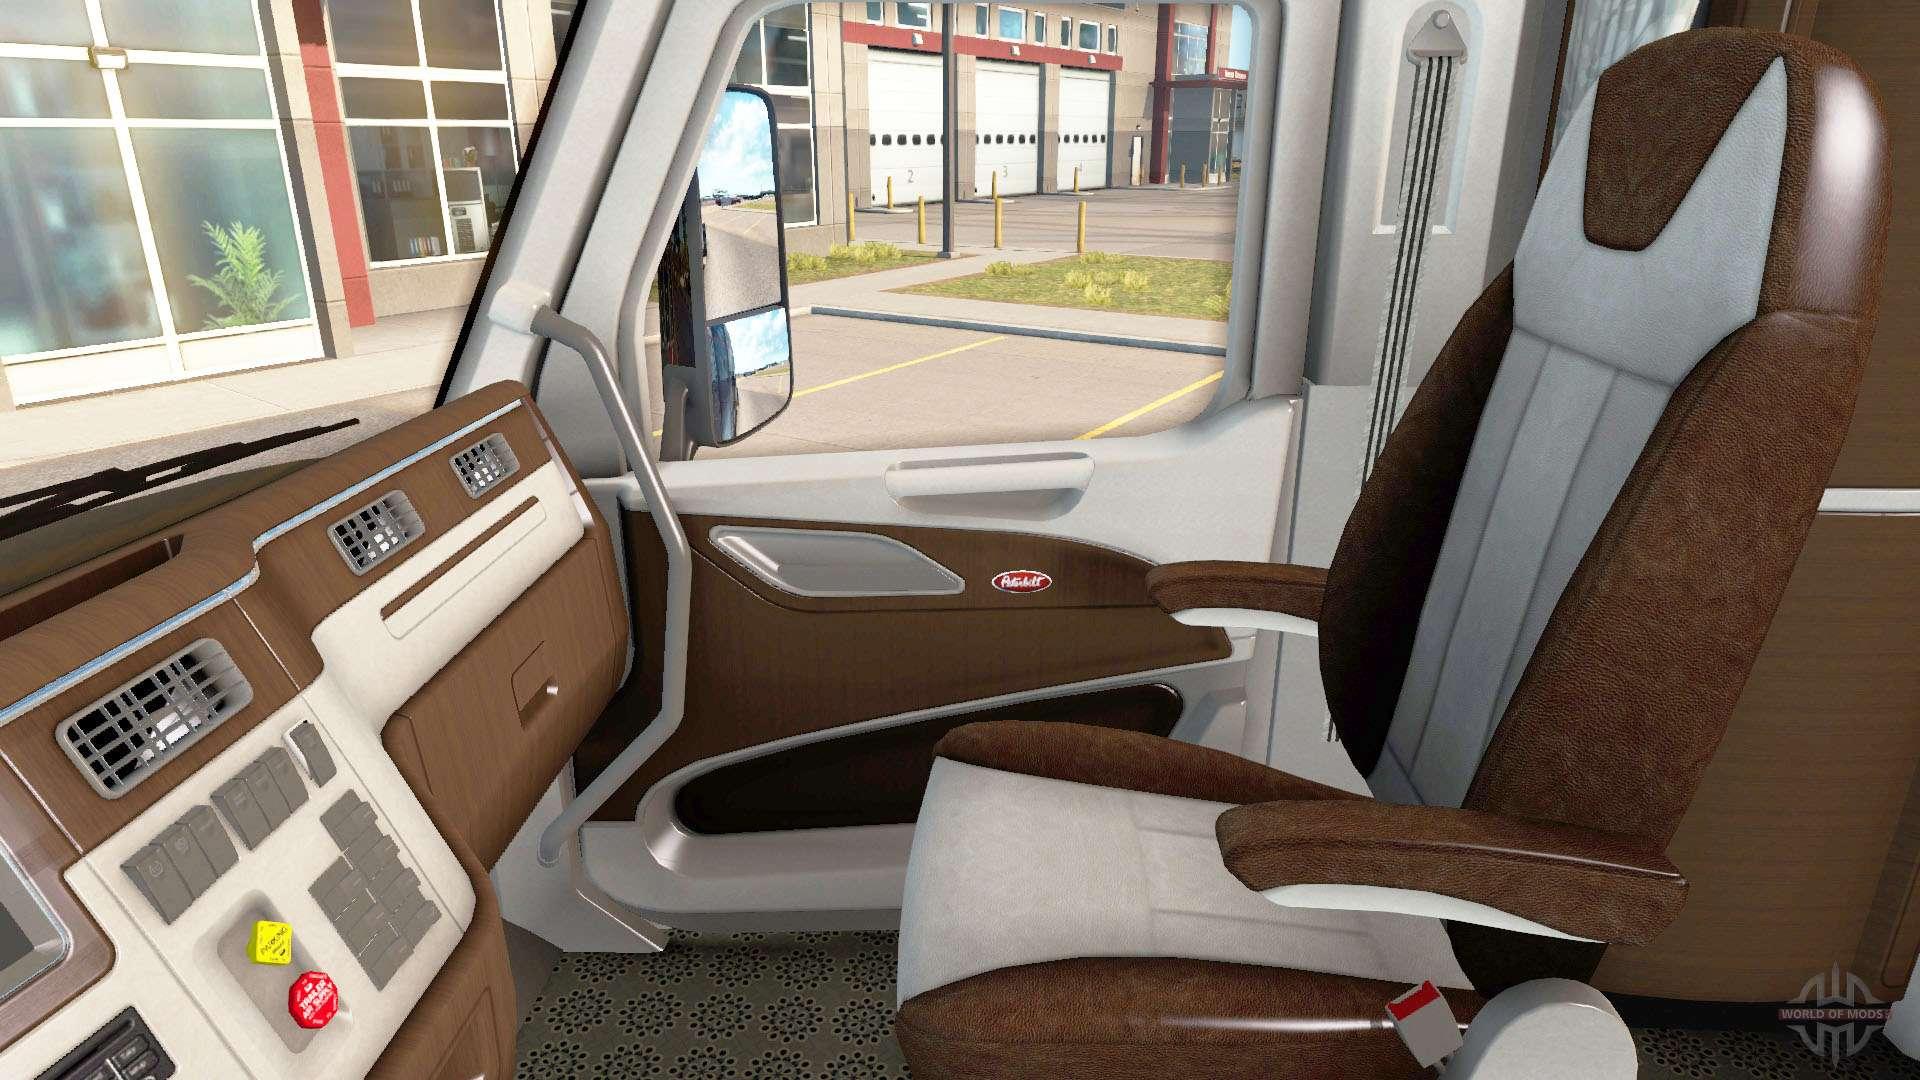 2017 Peterbilt 579 >> The new color Peterbilt 579 interior for American Truck Simulator